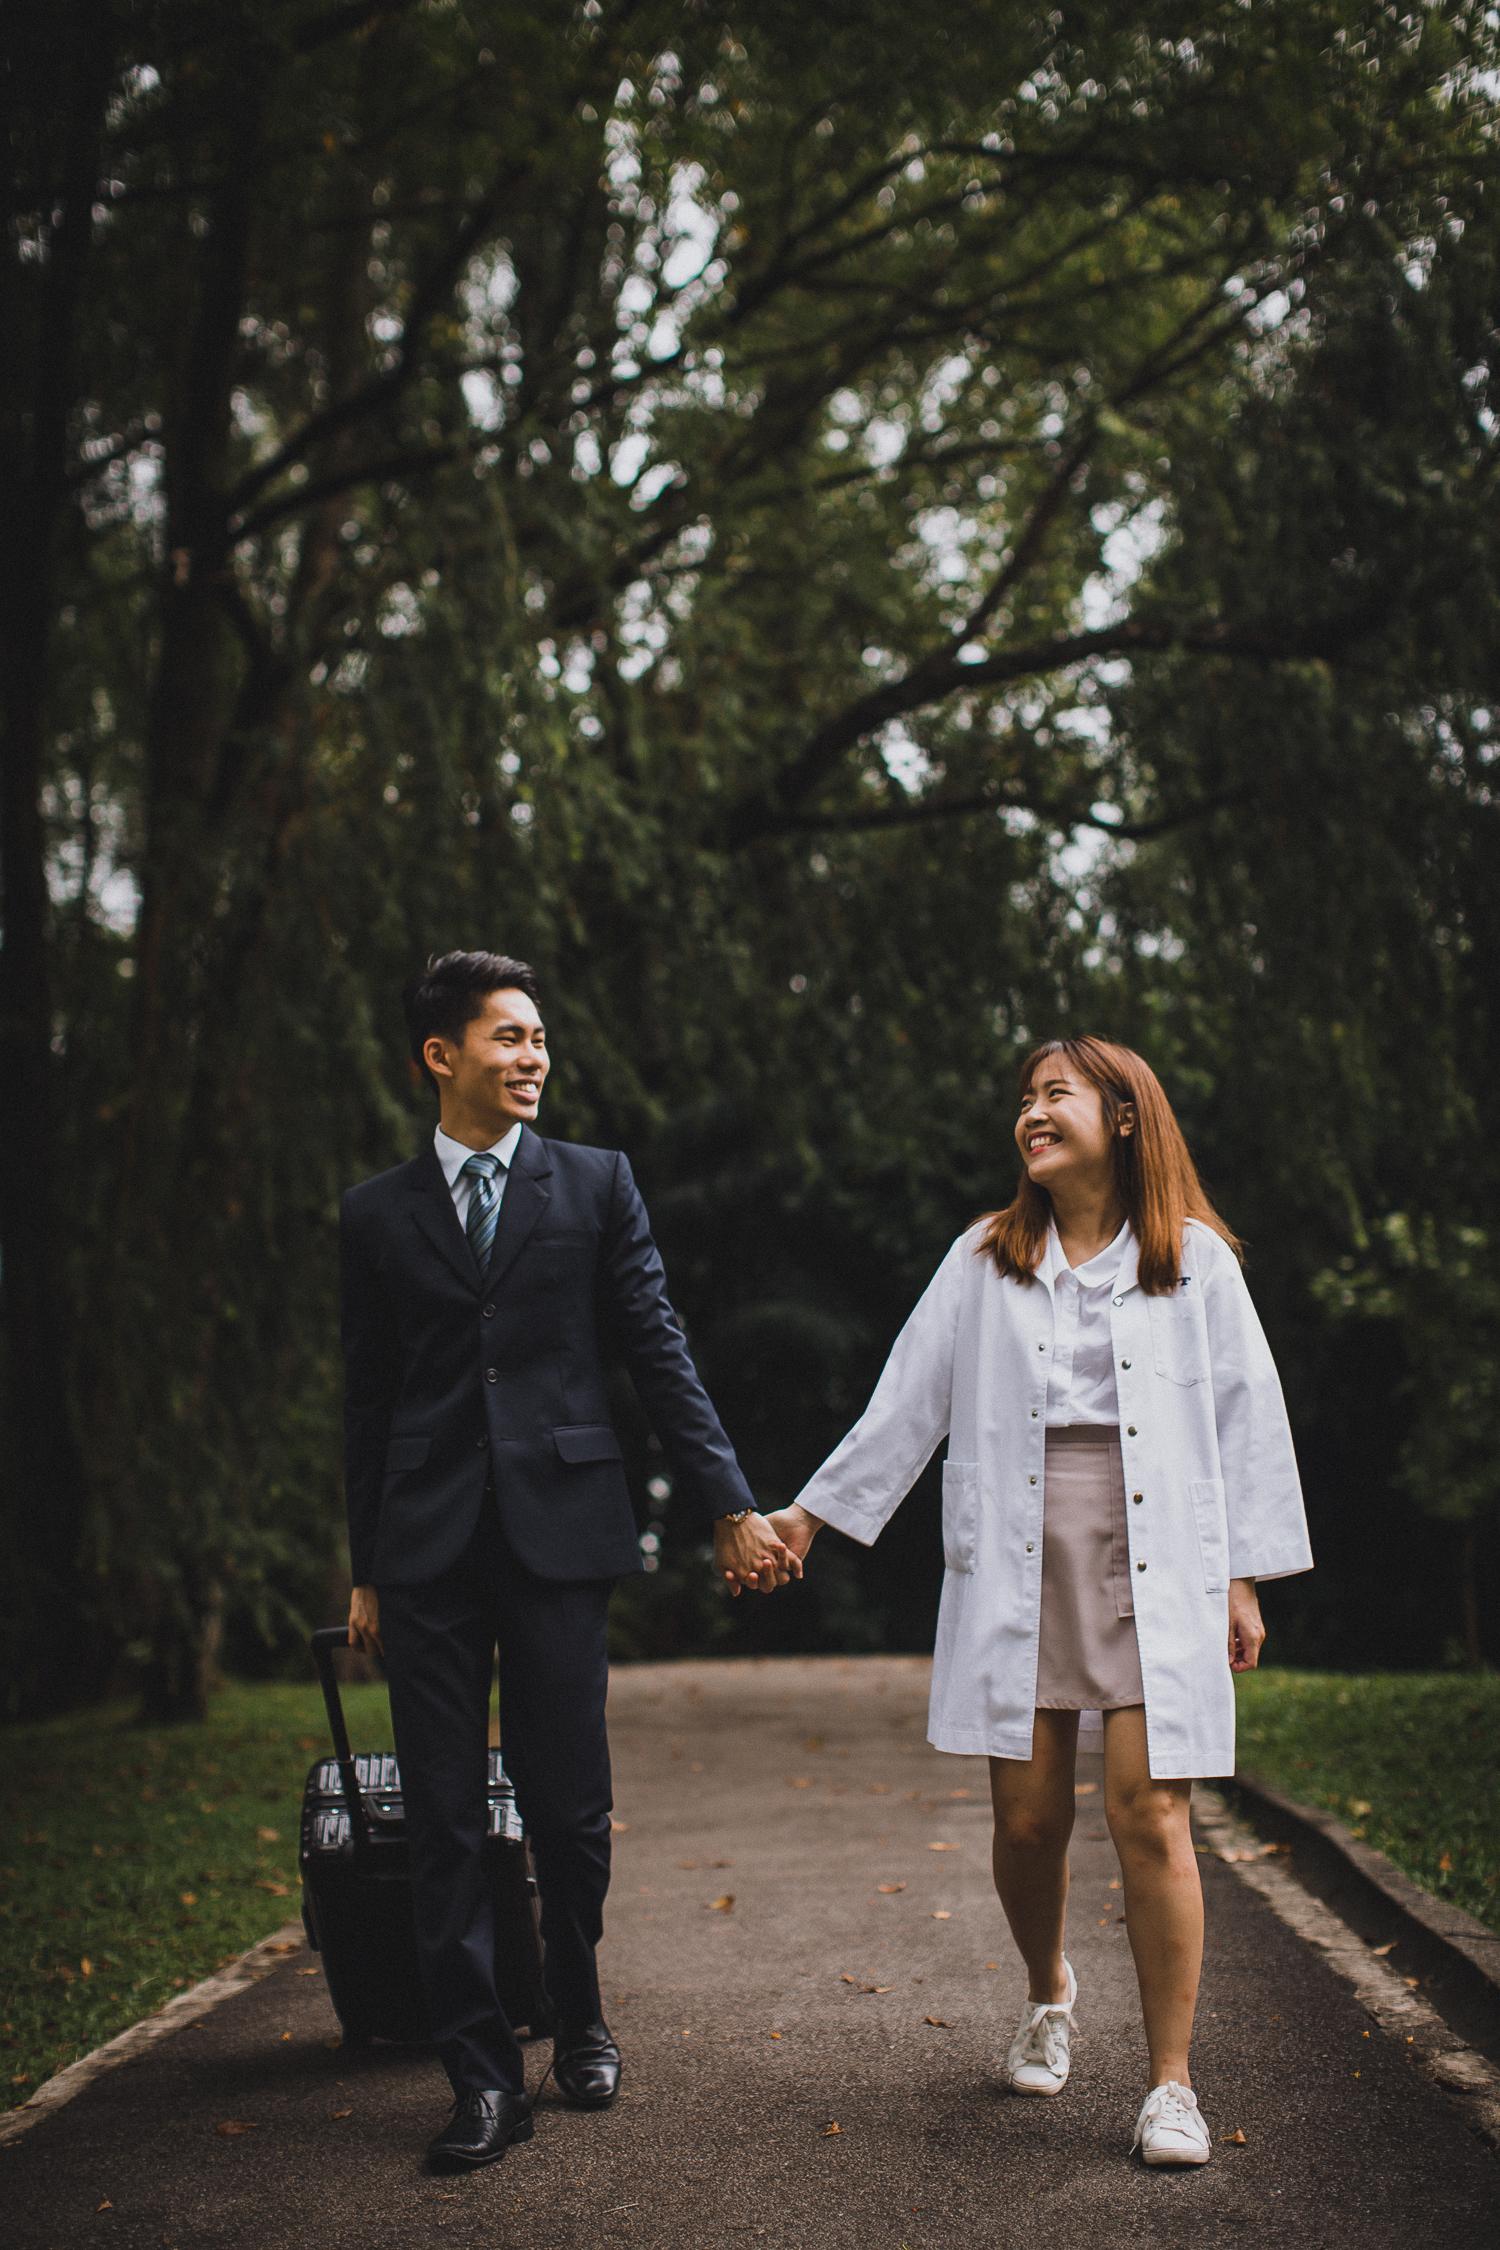 Singapore+Wedding+Photographer+Pre-Wedding+Couple+Zhiyu+Huimin-0031.jpg